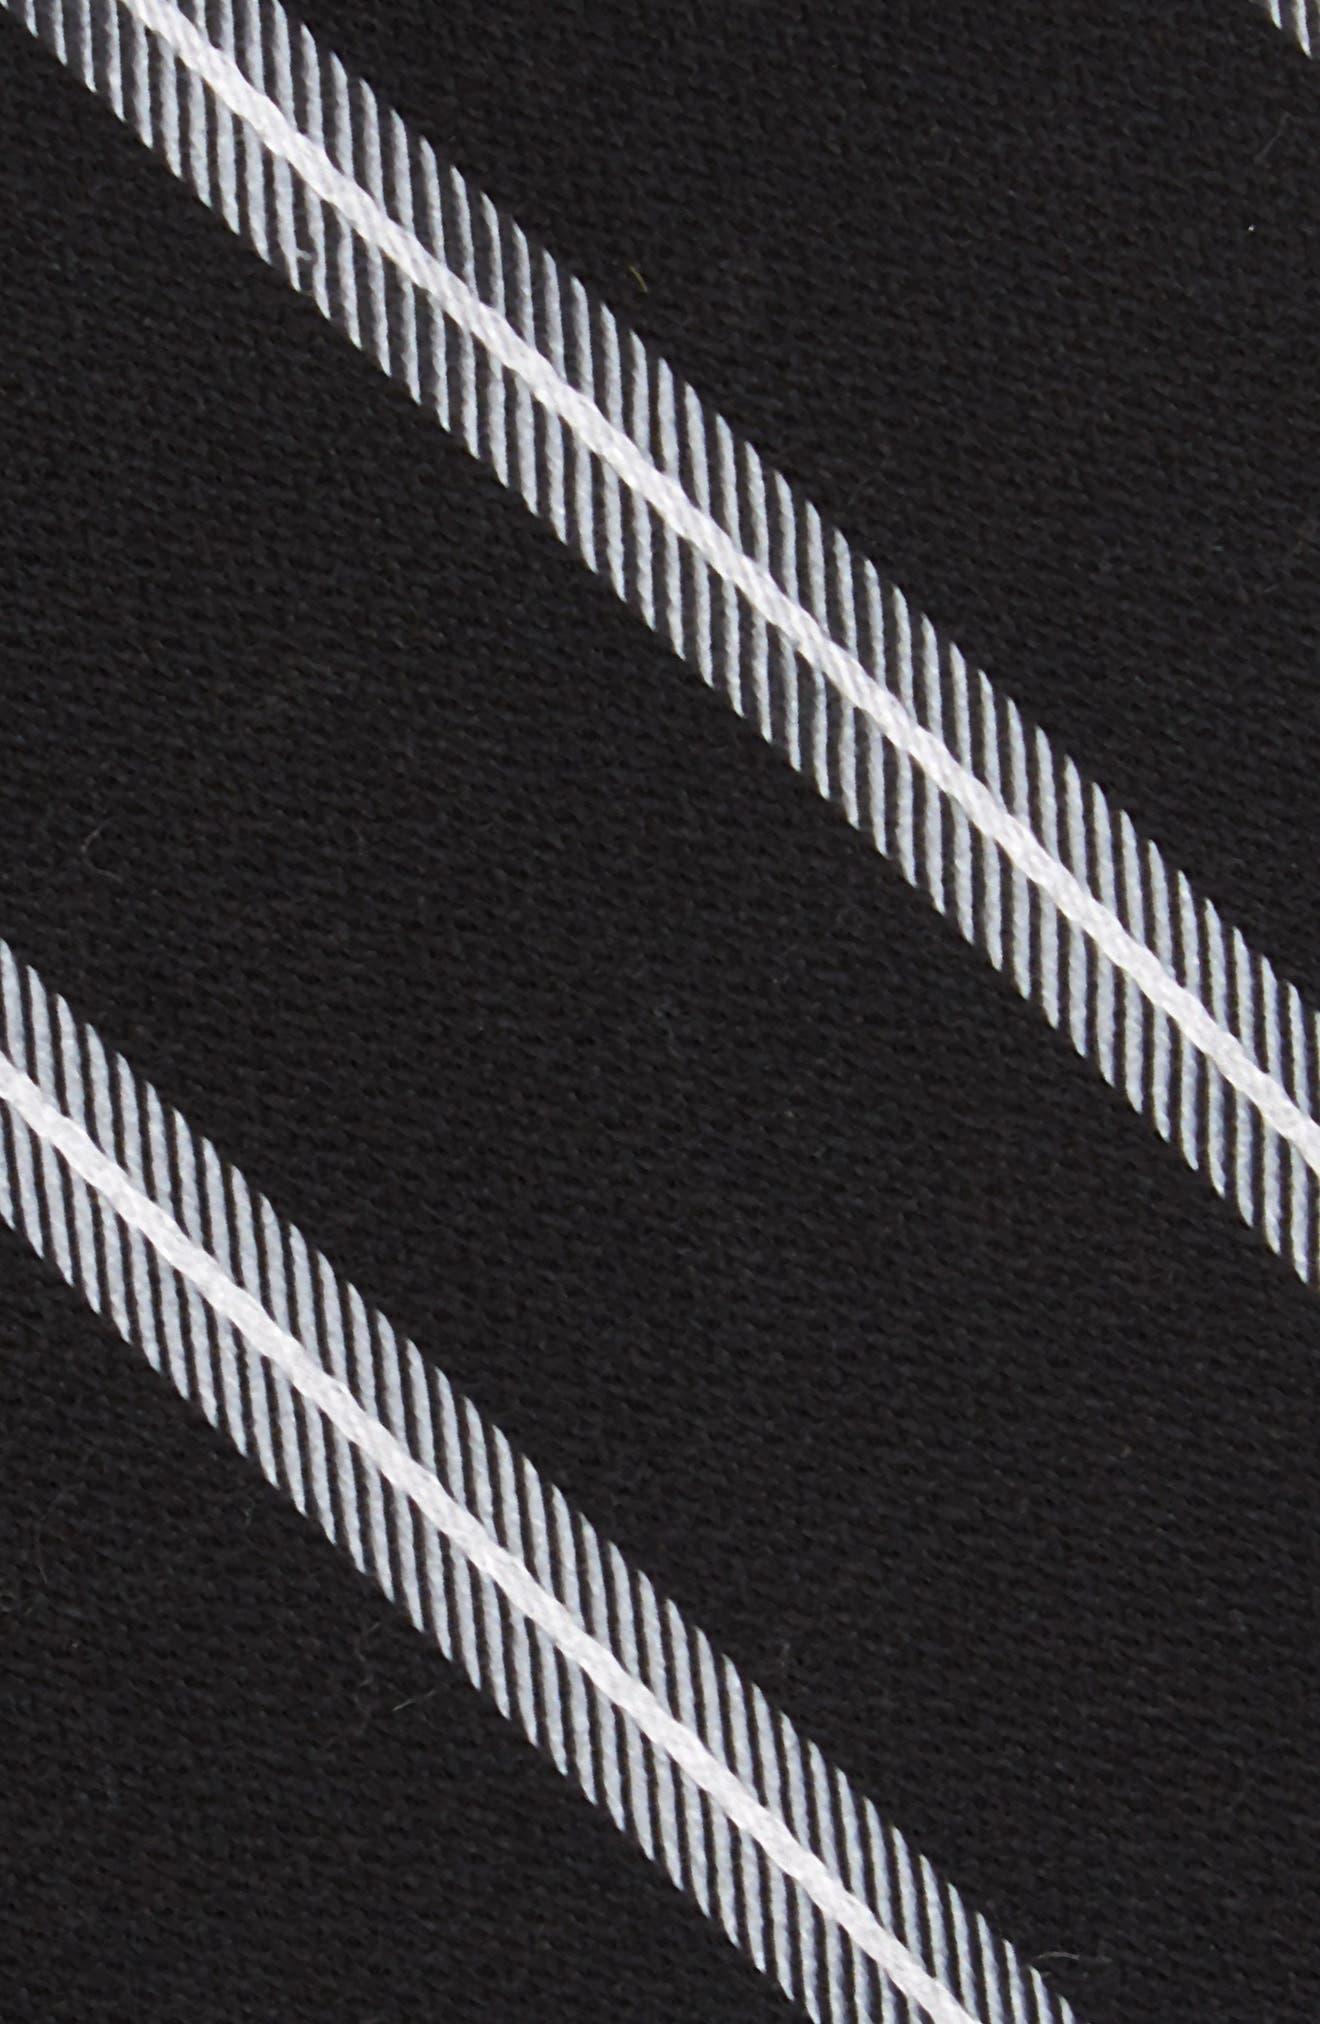 Edinger Stripe Silk & Cotton Tie,                             Alternate thumbnail 2, color,                             001